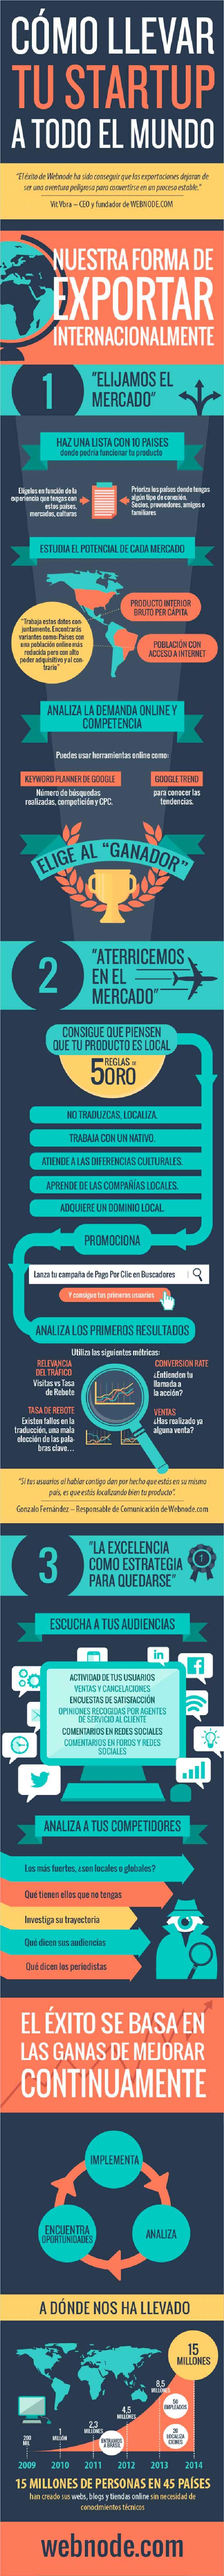 Infografia sobre como exportar vuestra StartUp